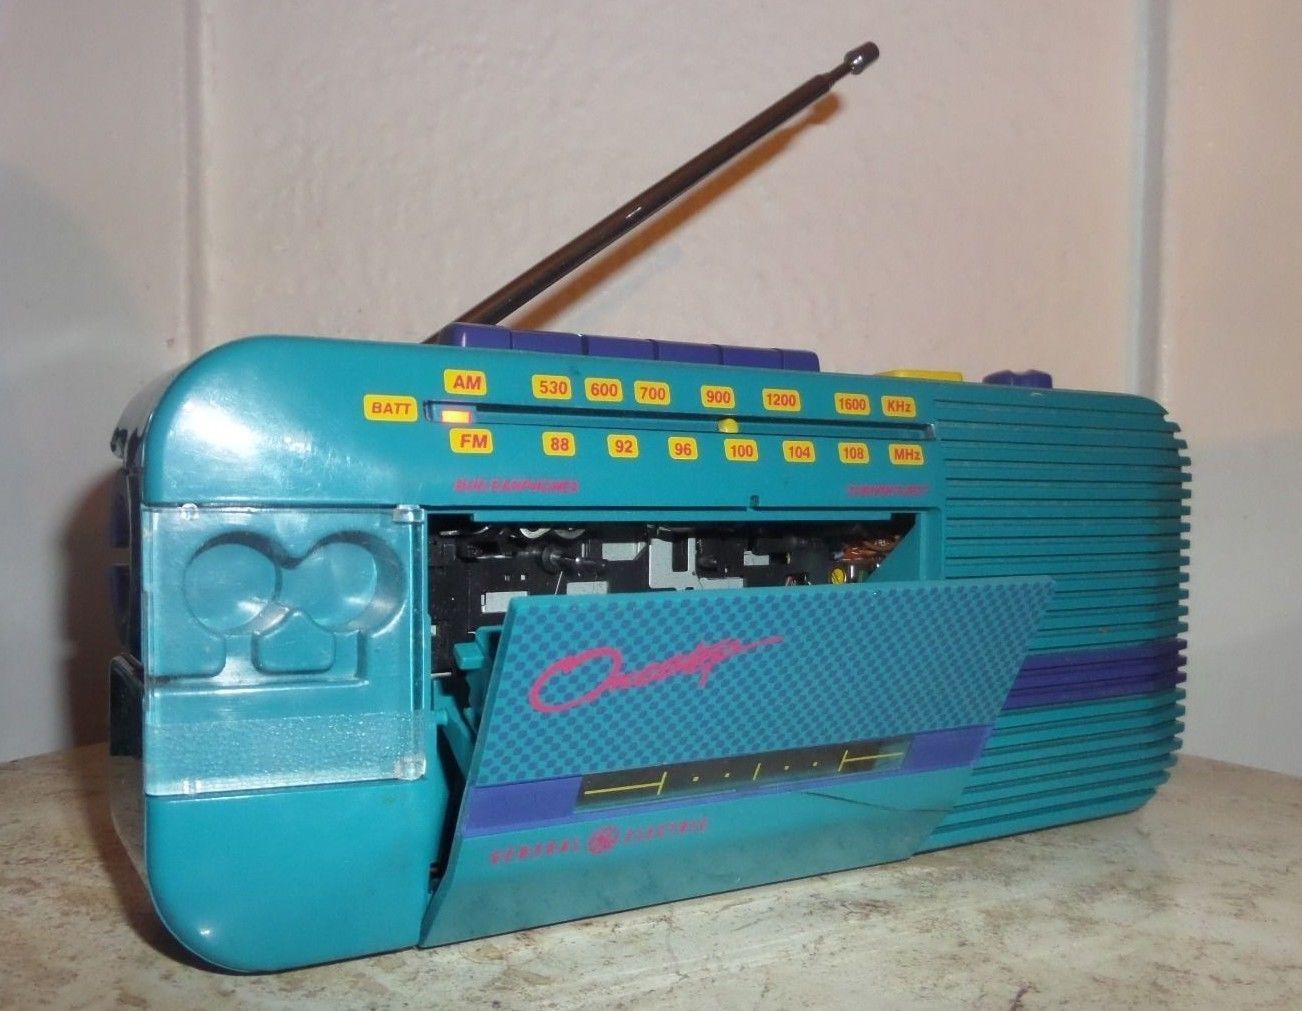 79968937091c0 90's Retro General Electric Onestep Cassette Tape Player AM/FM Radio ...